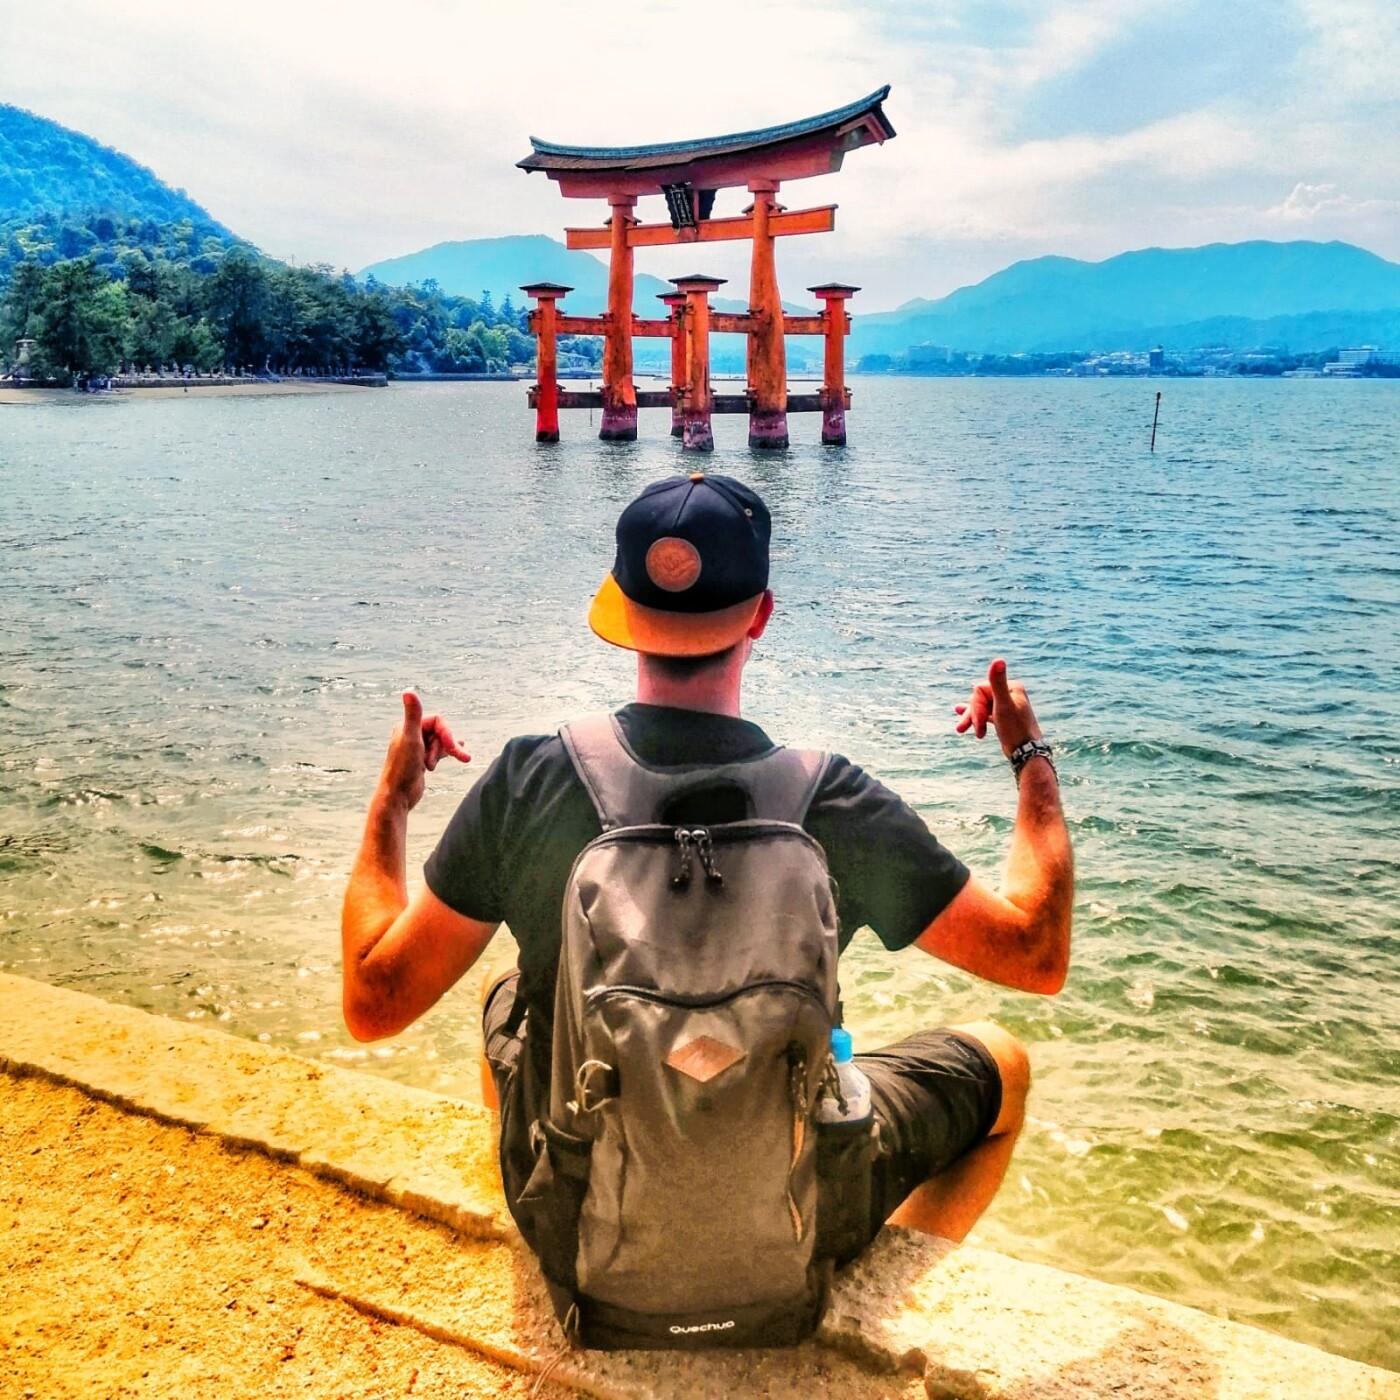 GreenWoodAntony est revenu plus serein du Japon - Globe Trotter 12 04 - Mars 2021 - StereoChic Radio